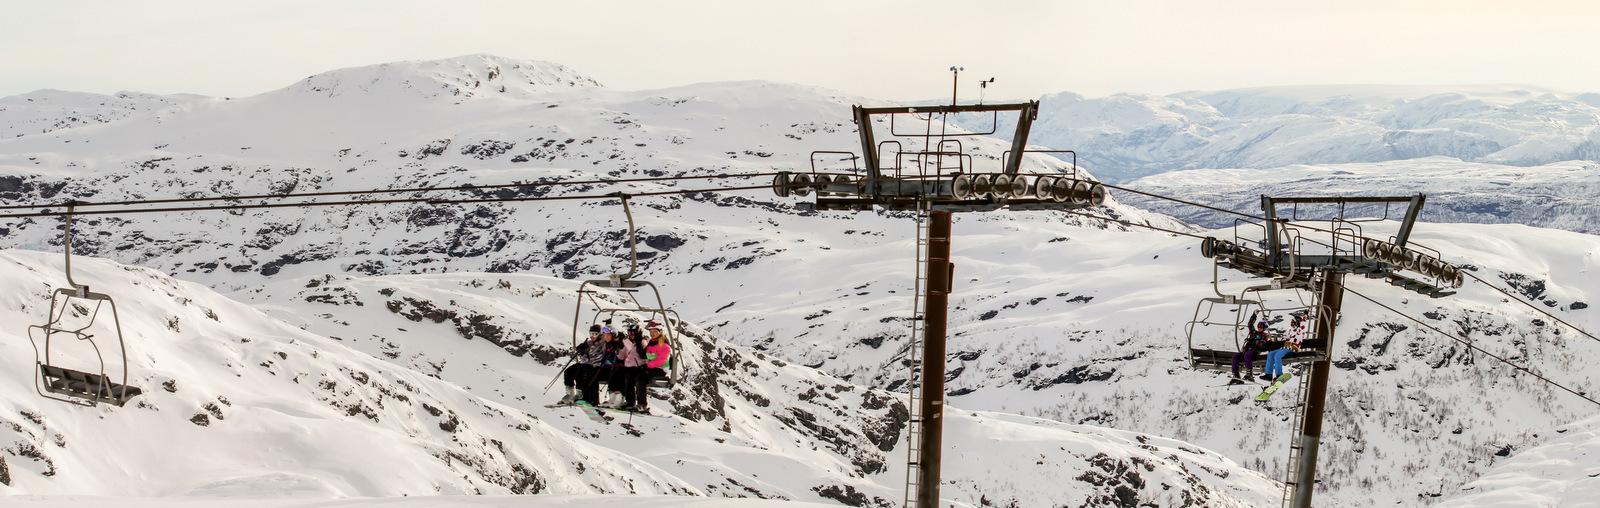 Eikedalen ski resort - © Eikedalen Skisenter